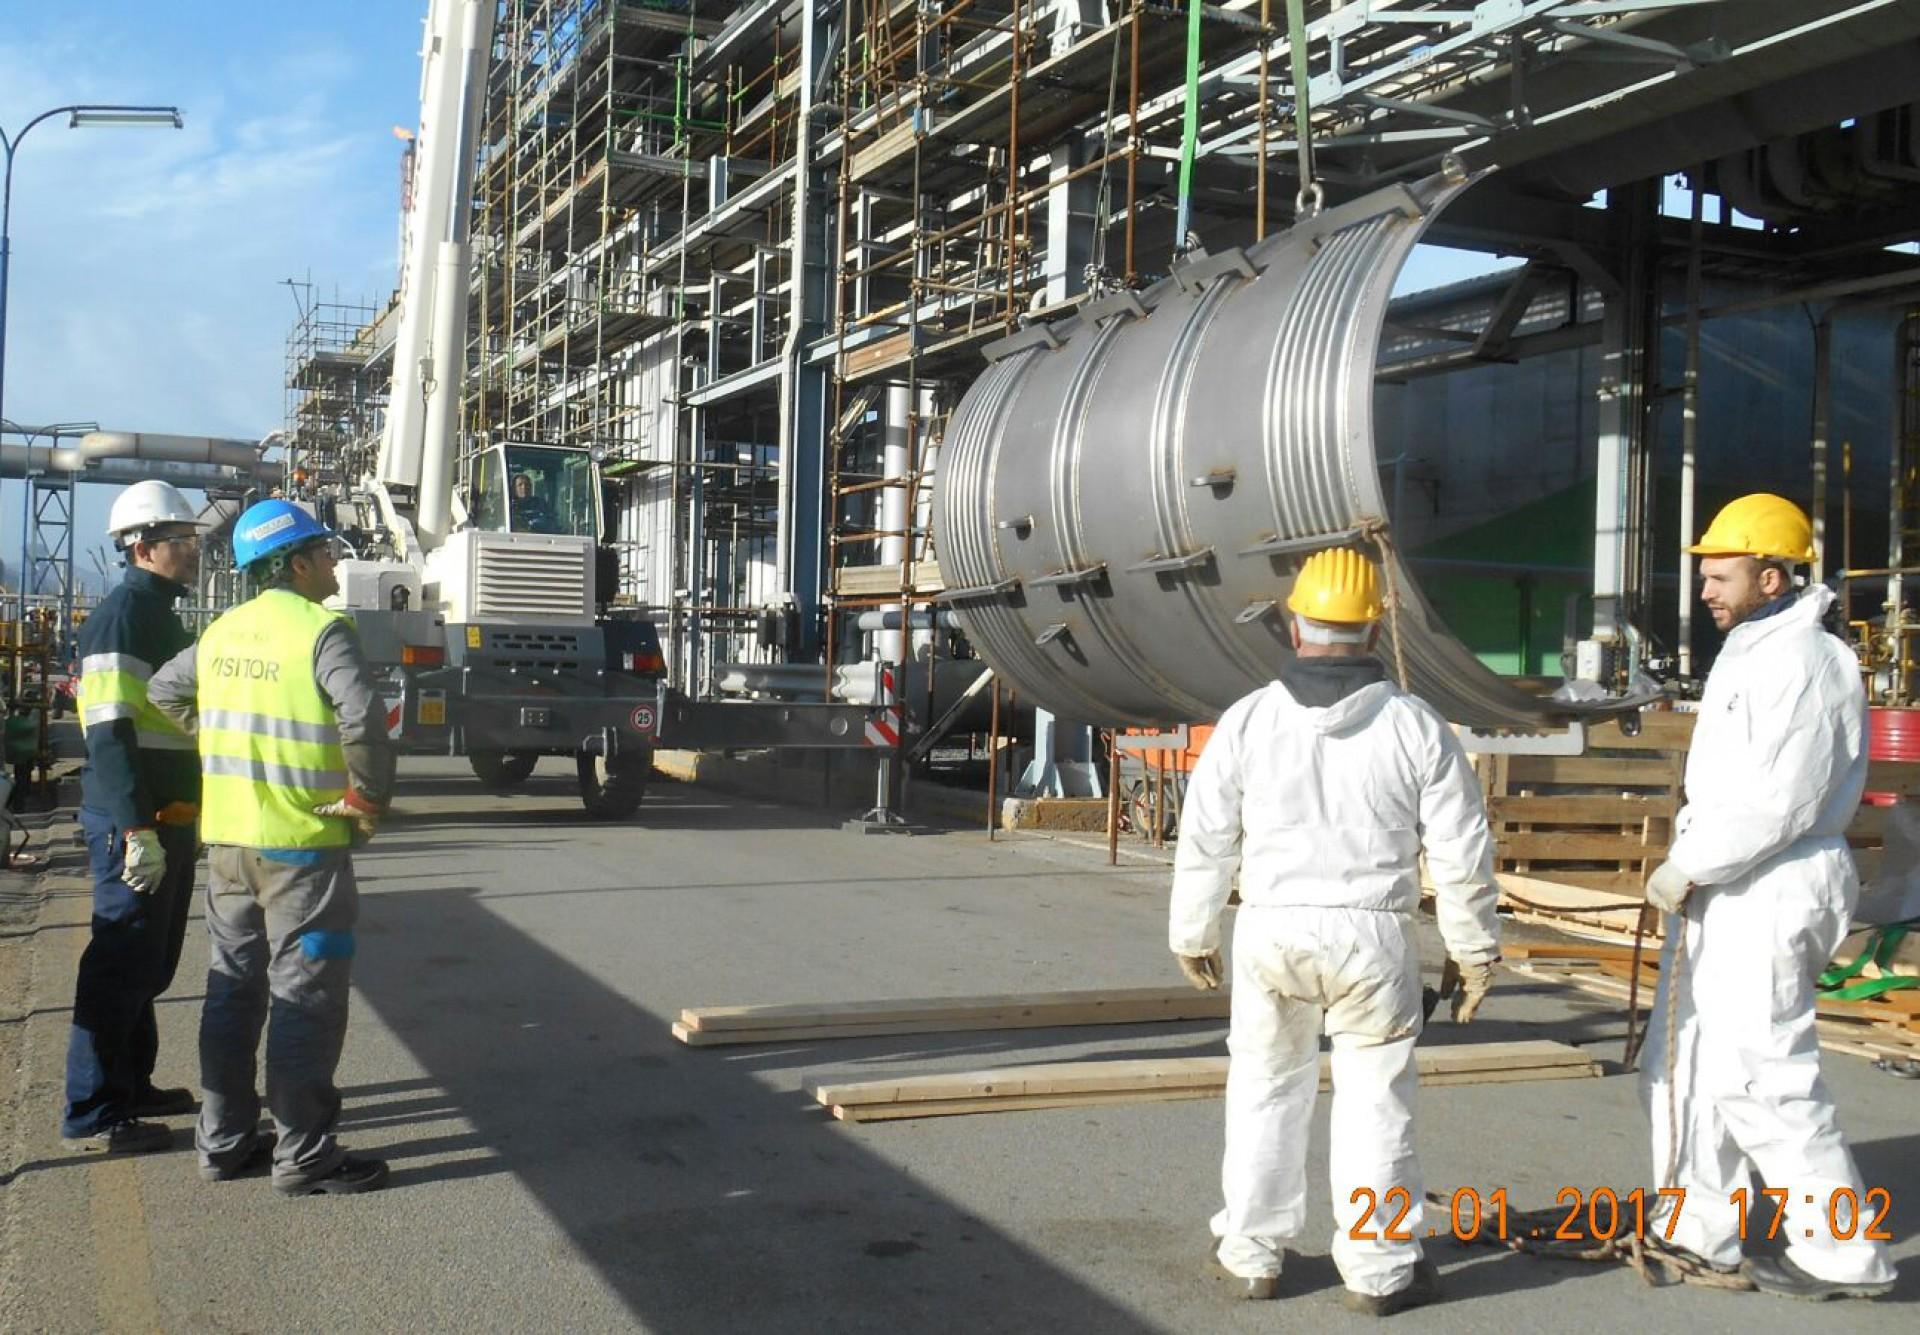 Emergency repair at a refinery